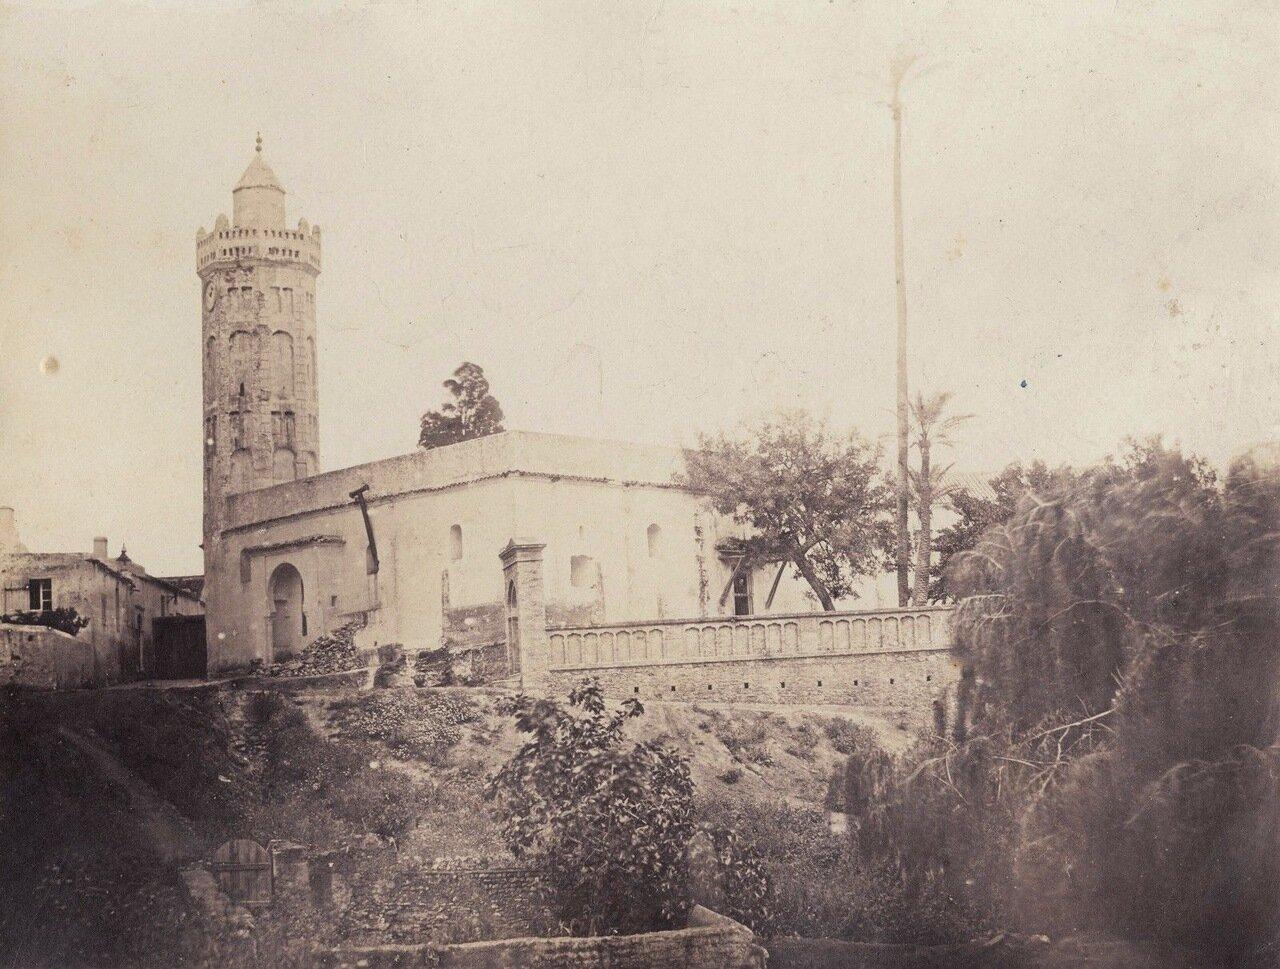 1856-1857. Мечеть (фотограф Феликс-Жак-Антуан Мулен)